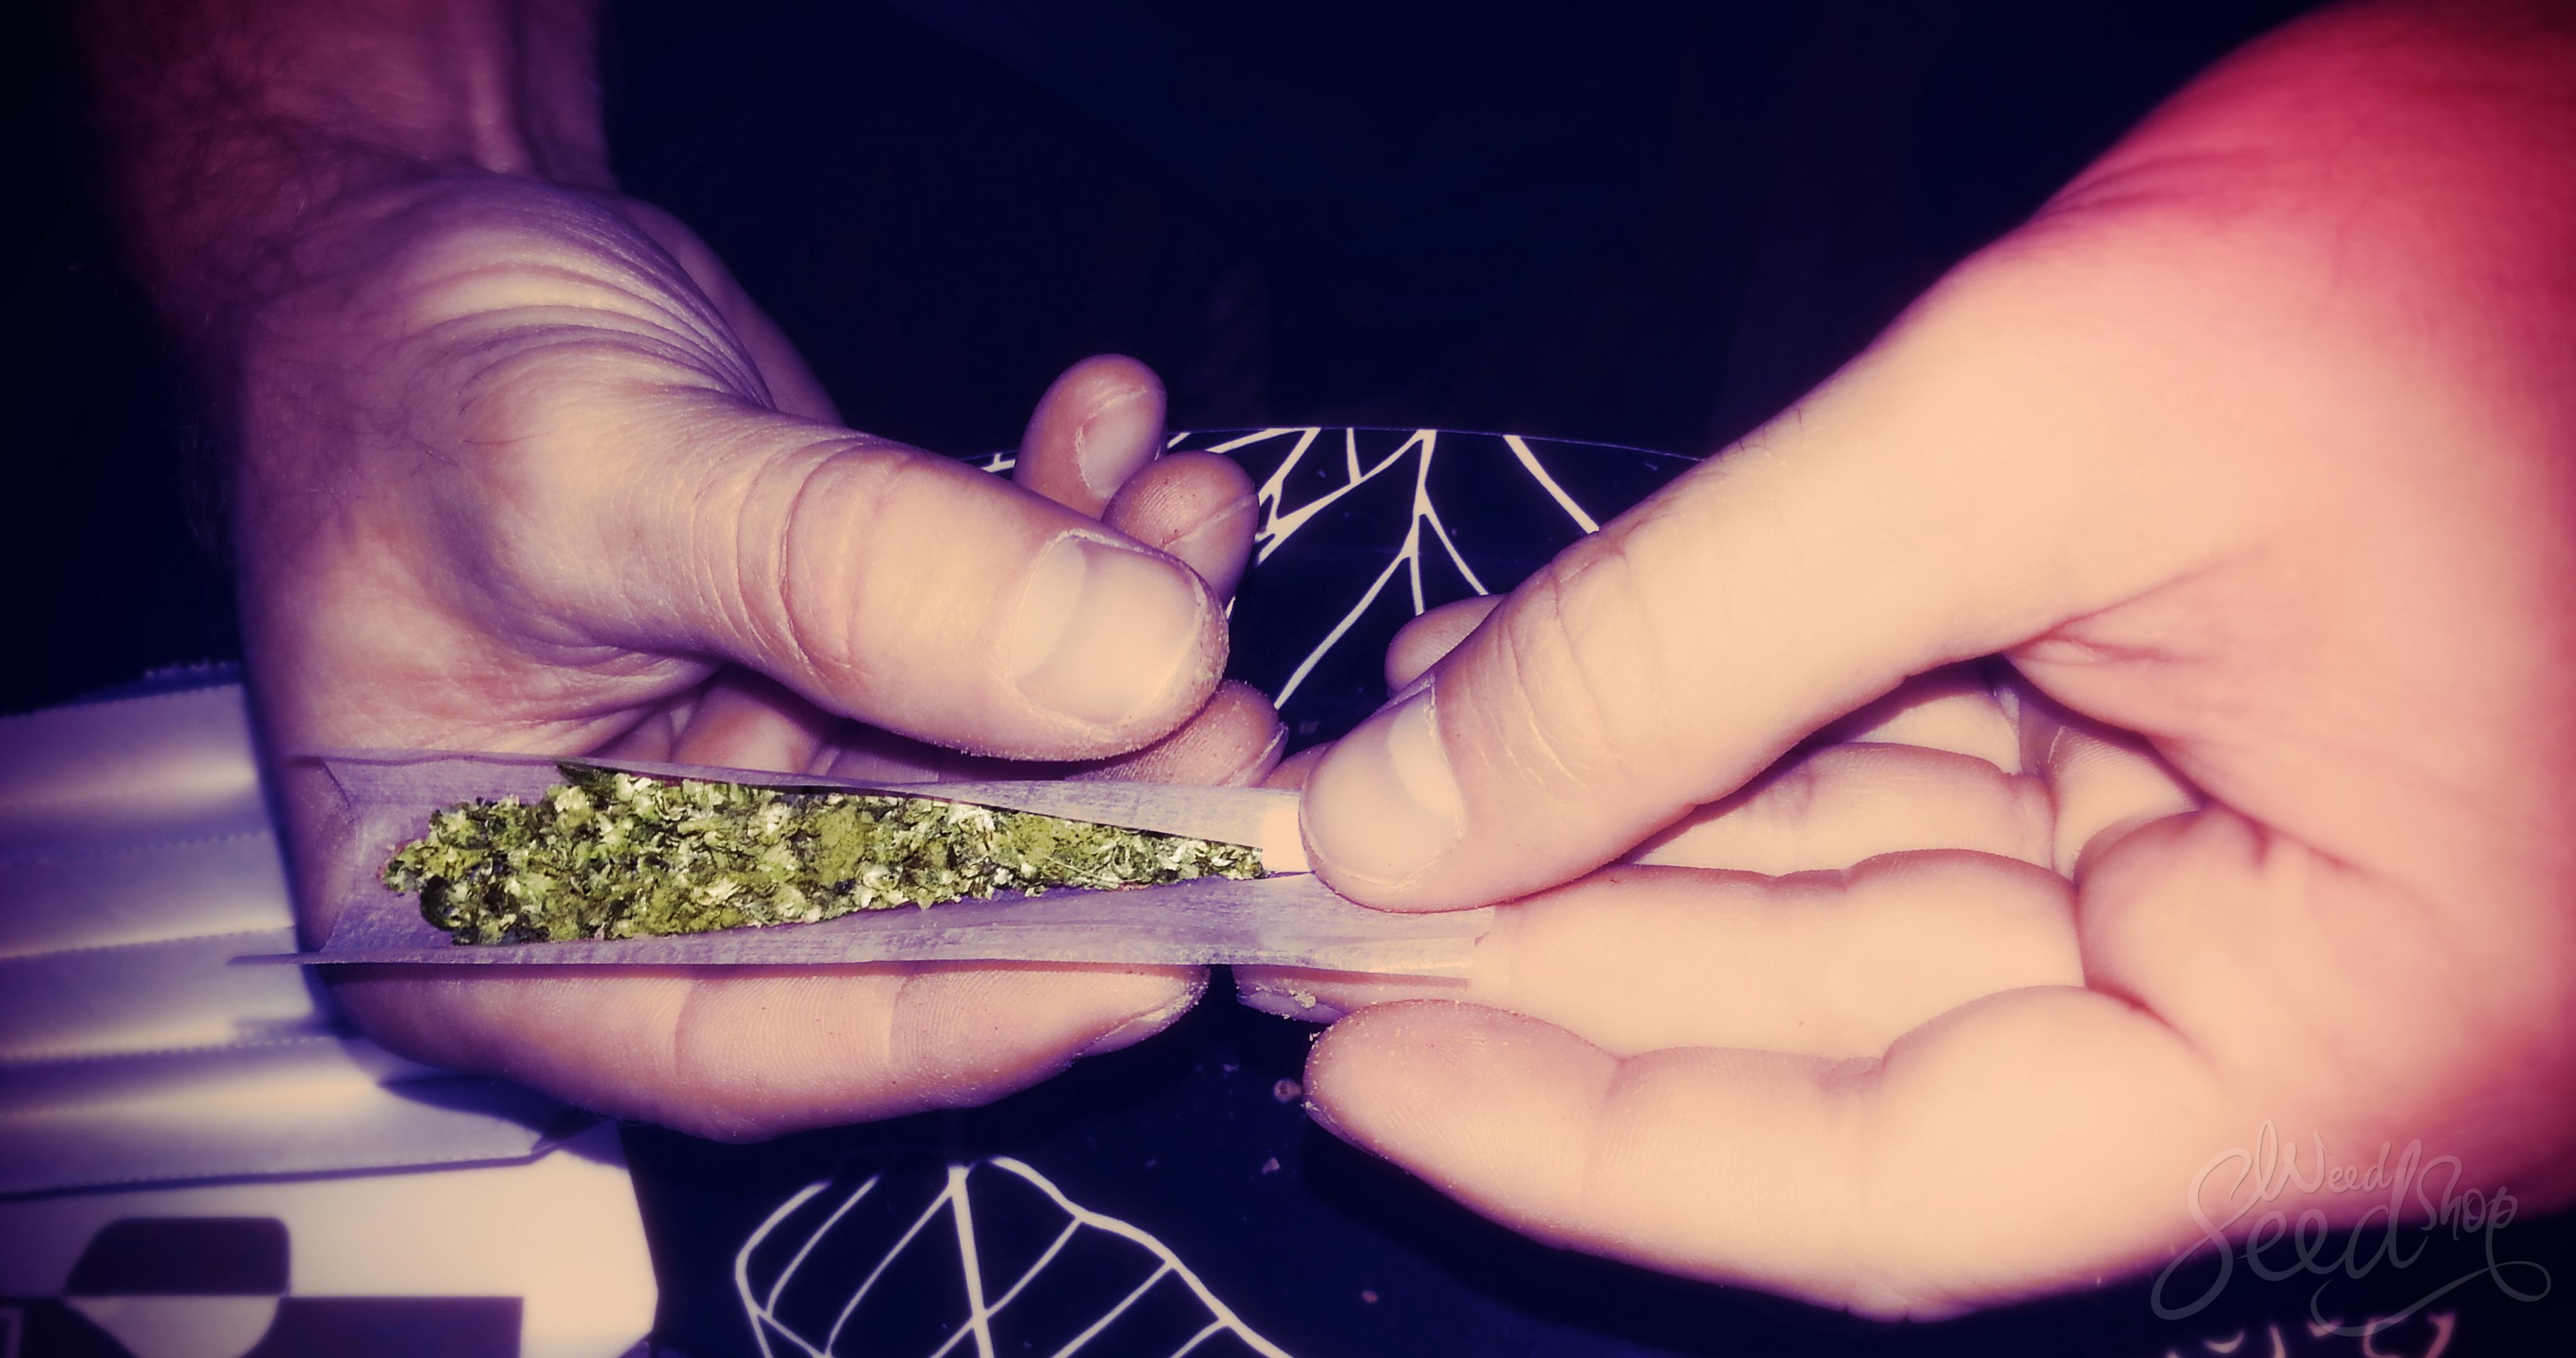 Des herbes pour remplacer le tabac dans les joints - WeedSeedShop Blog